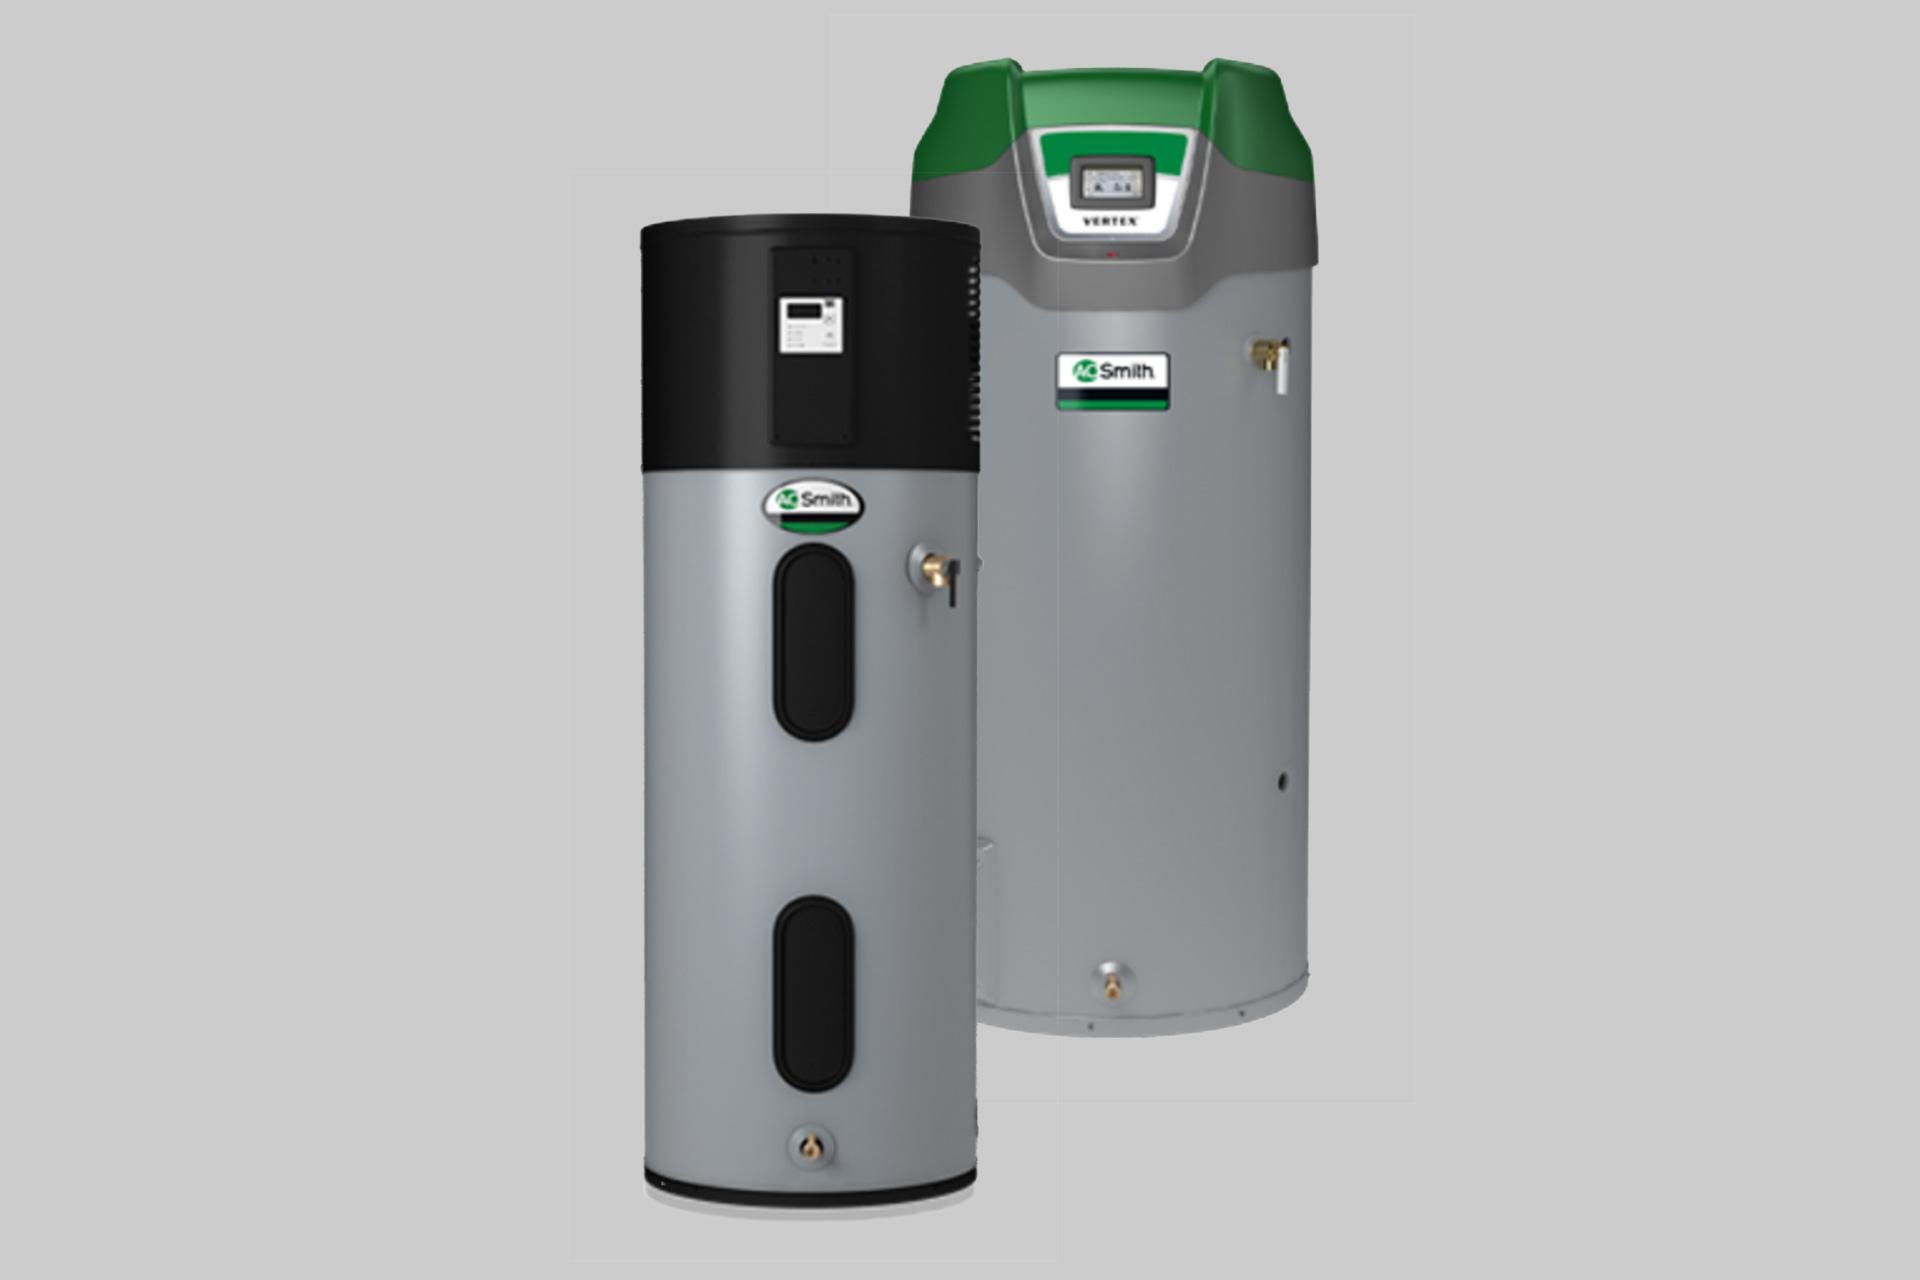 https://lakecontractingcelina.com/files/uploads/2021/03/AOSmtih-Water-Heaters_1920x1280.jpg